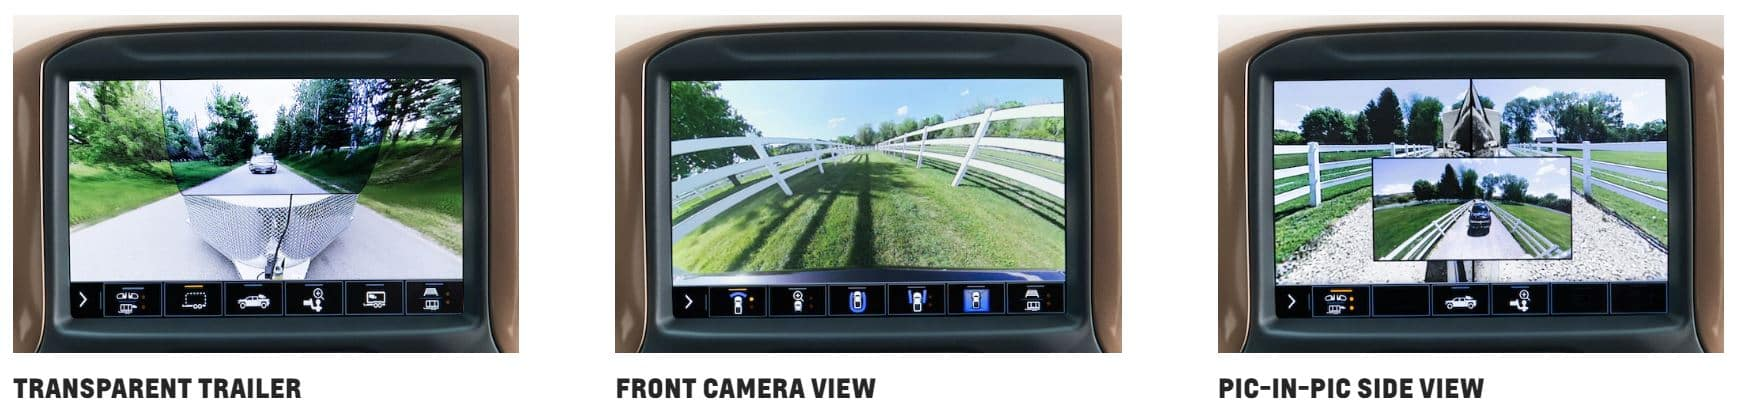 three camera views of Chevrolet Silverado